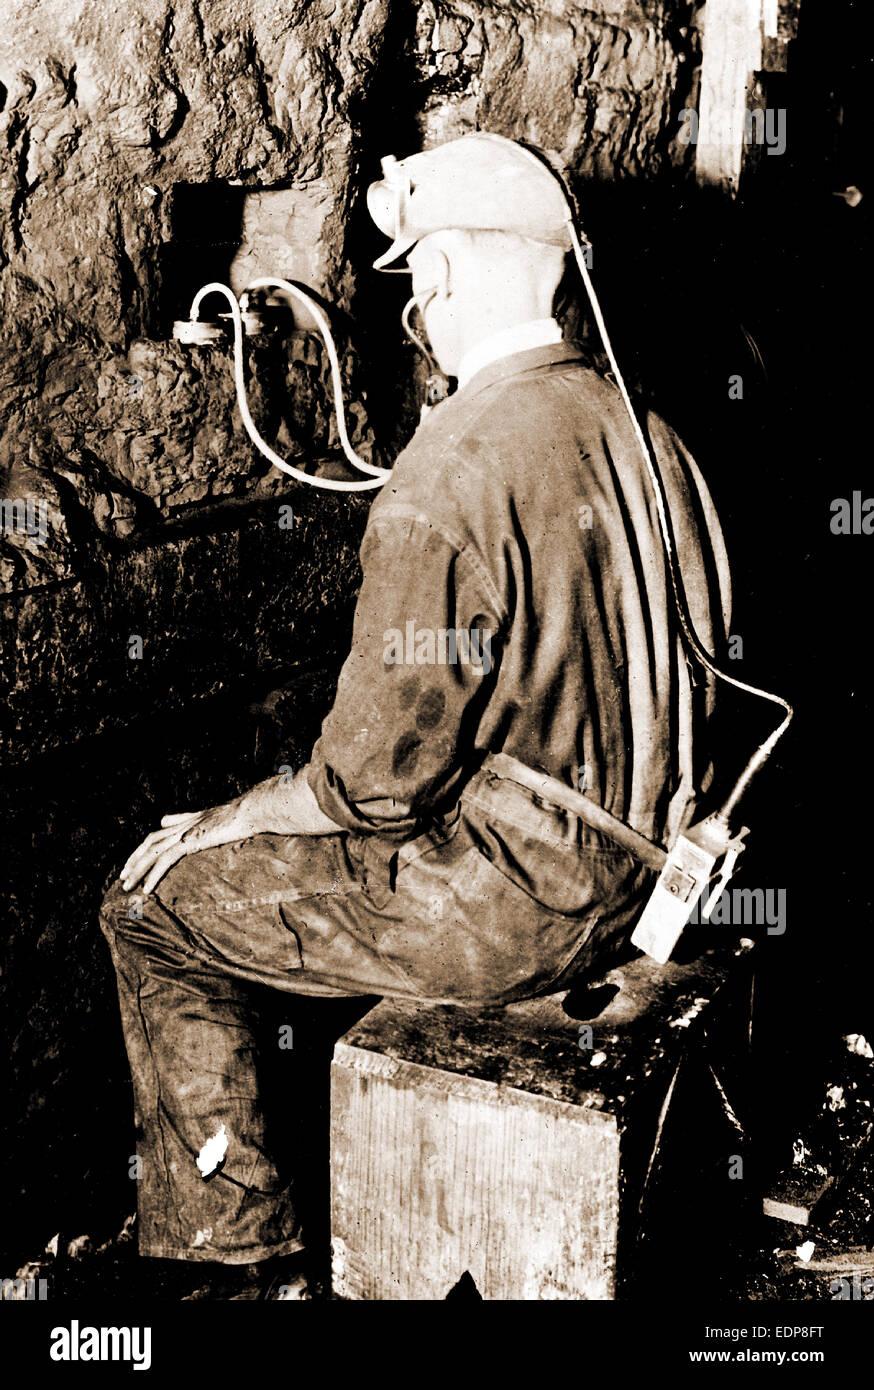 Geophone, Mining, Telephones, 1910 - Stock Image